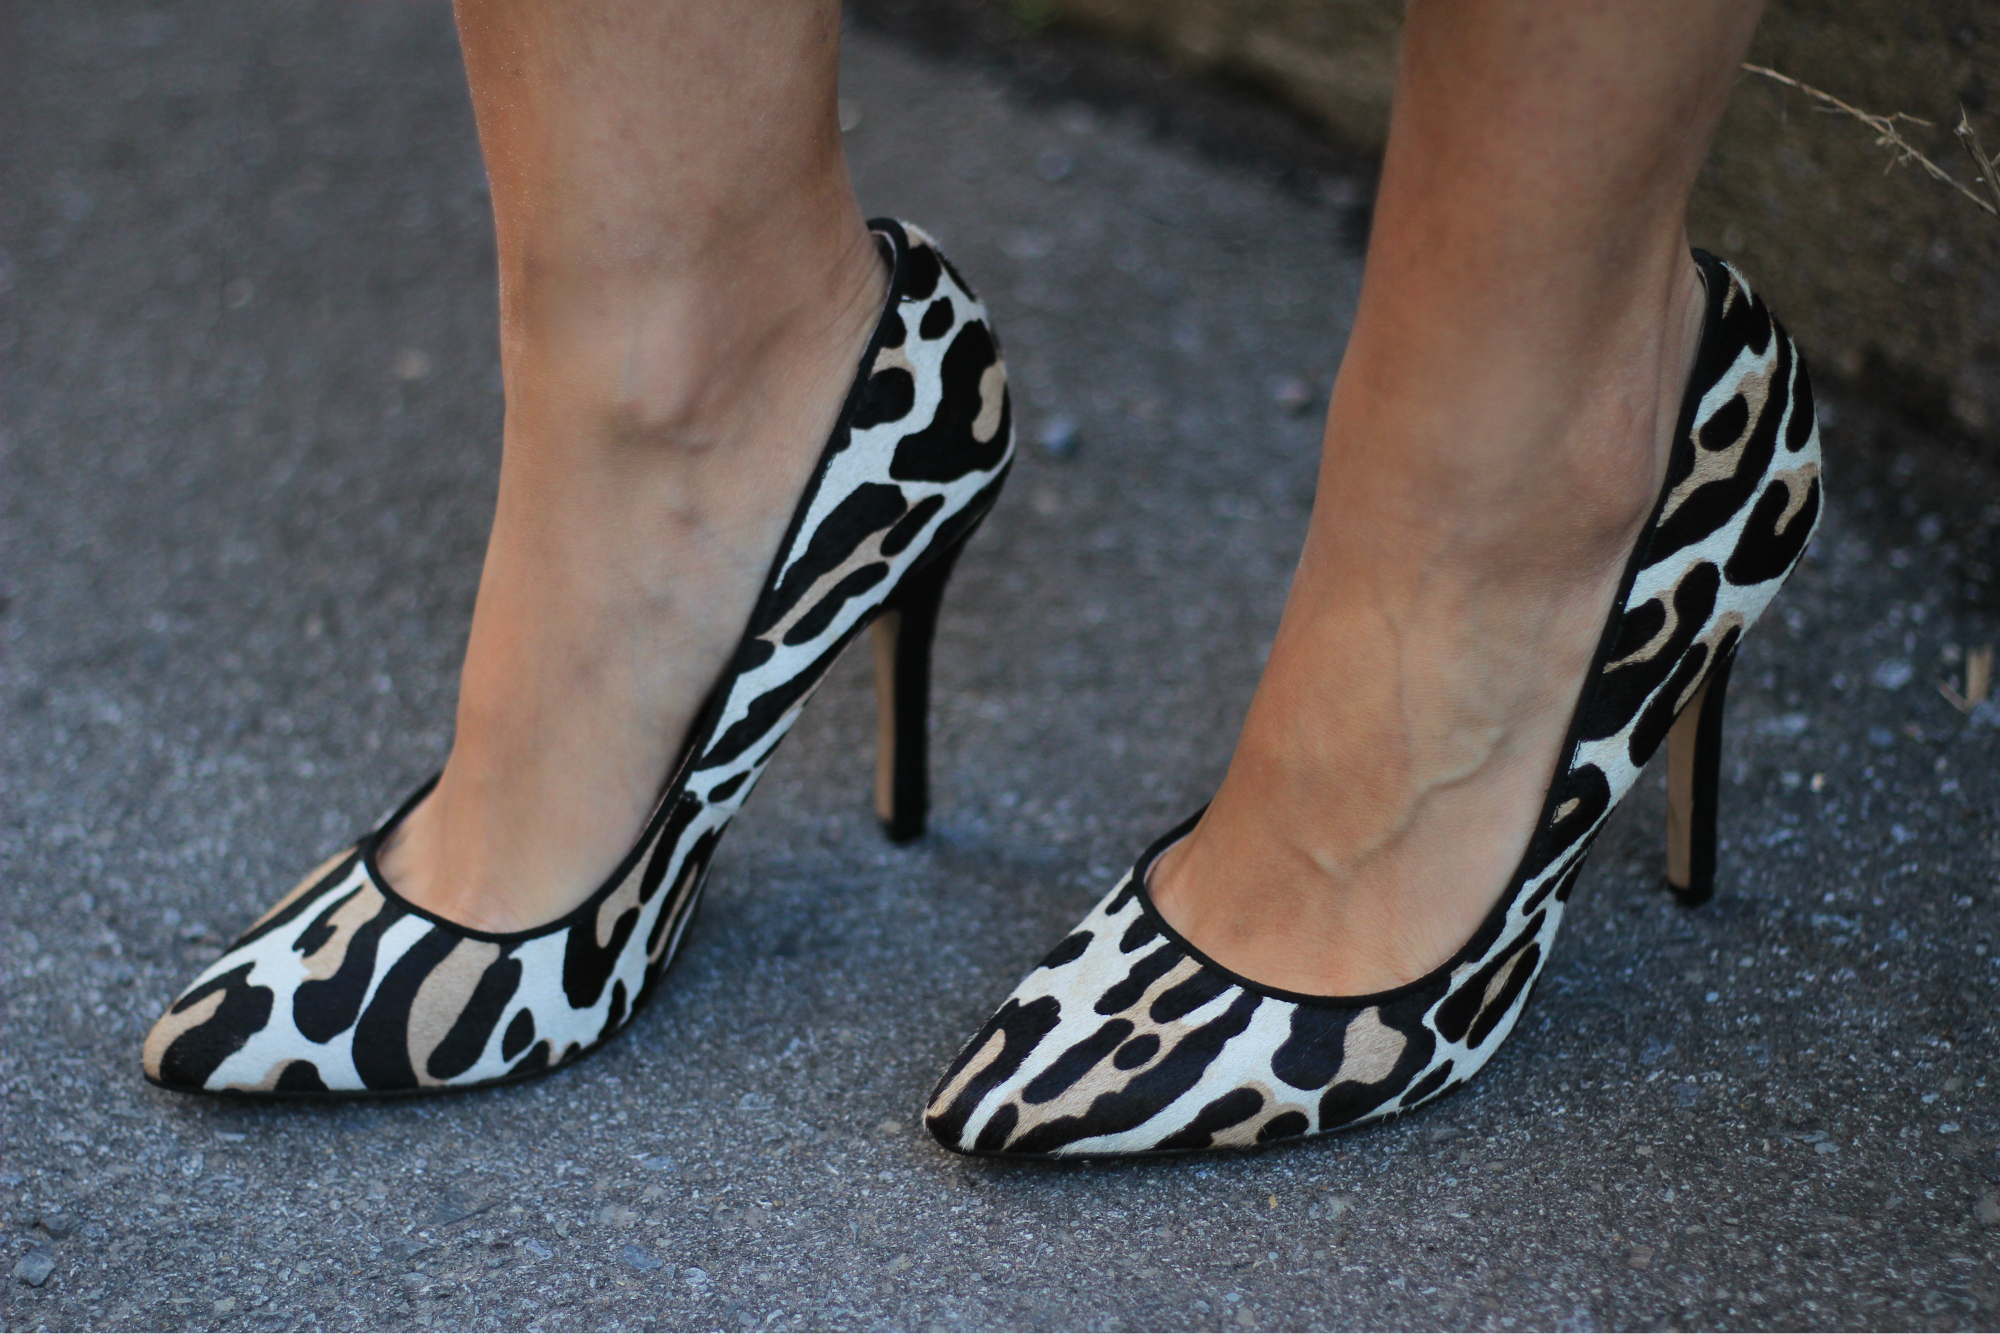 7c58d44463a8 ALDO leopard shoes | The Fashion Medley – The Fashion Medley